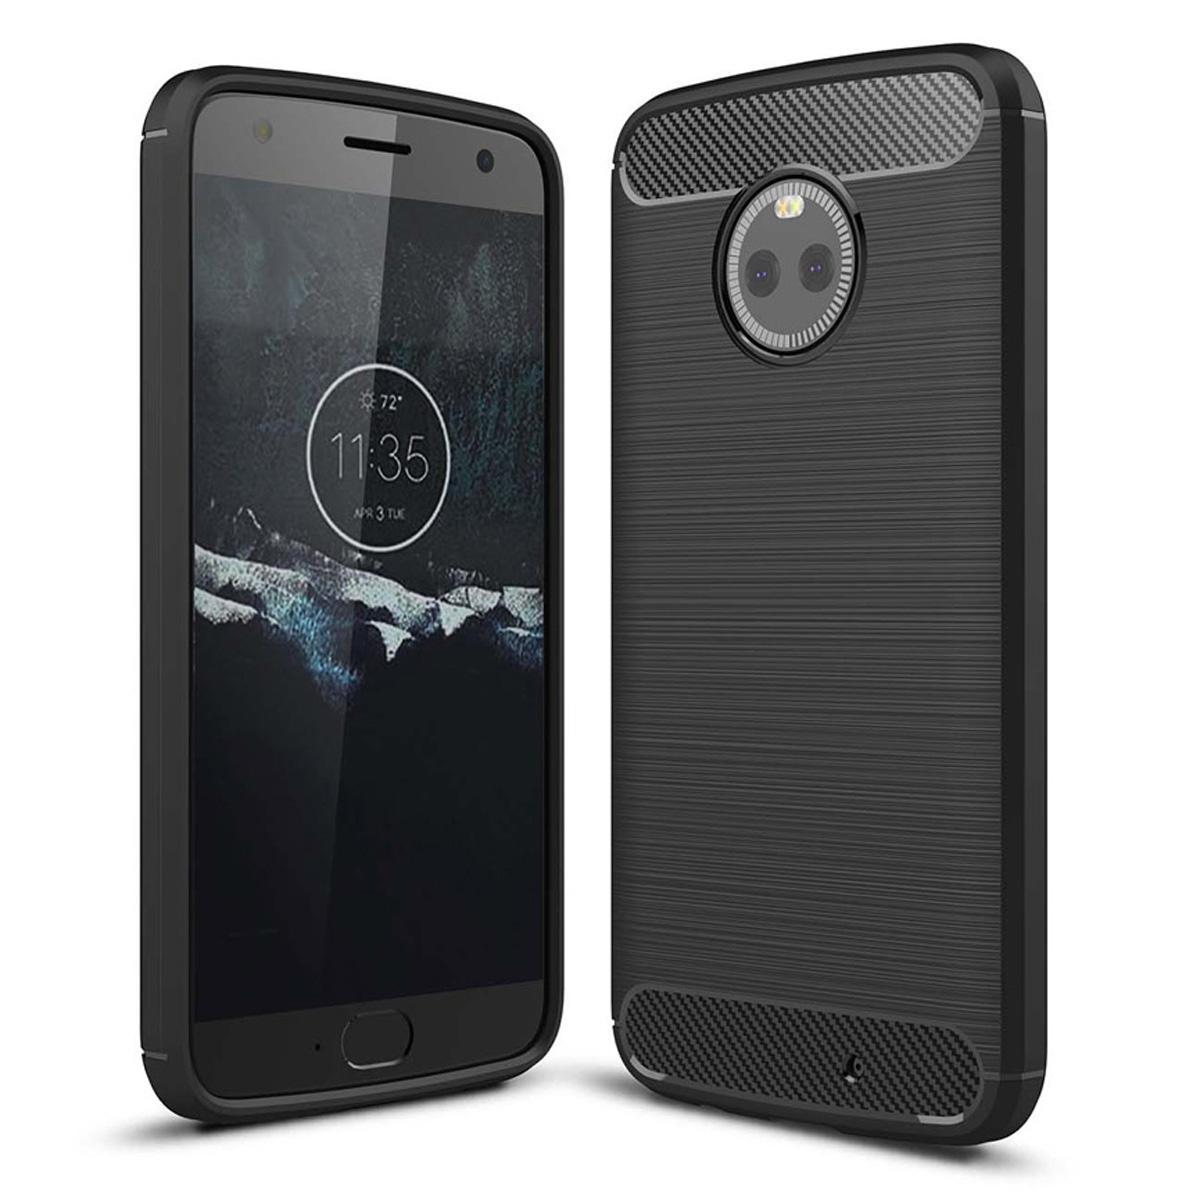 852a4dcfd Dayspirit Wire Drawing Carbon Fiber TPU Back Case for Motorola Moto X4 -  Black